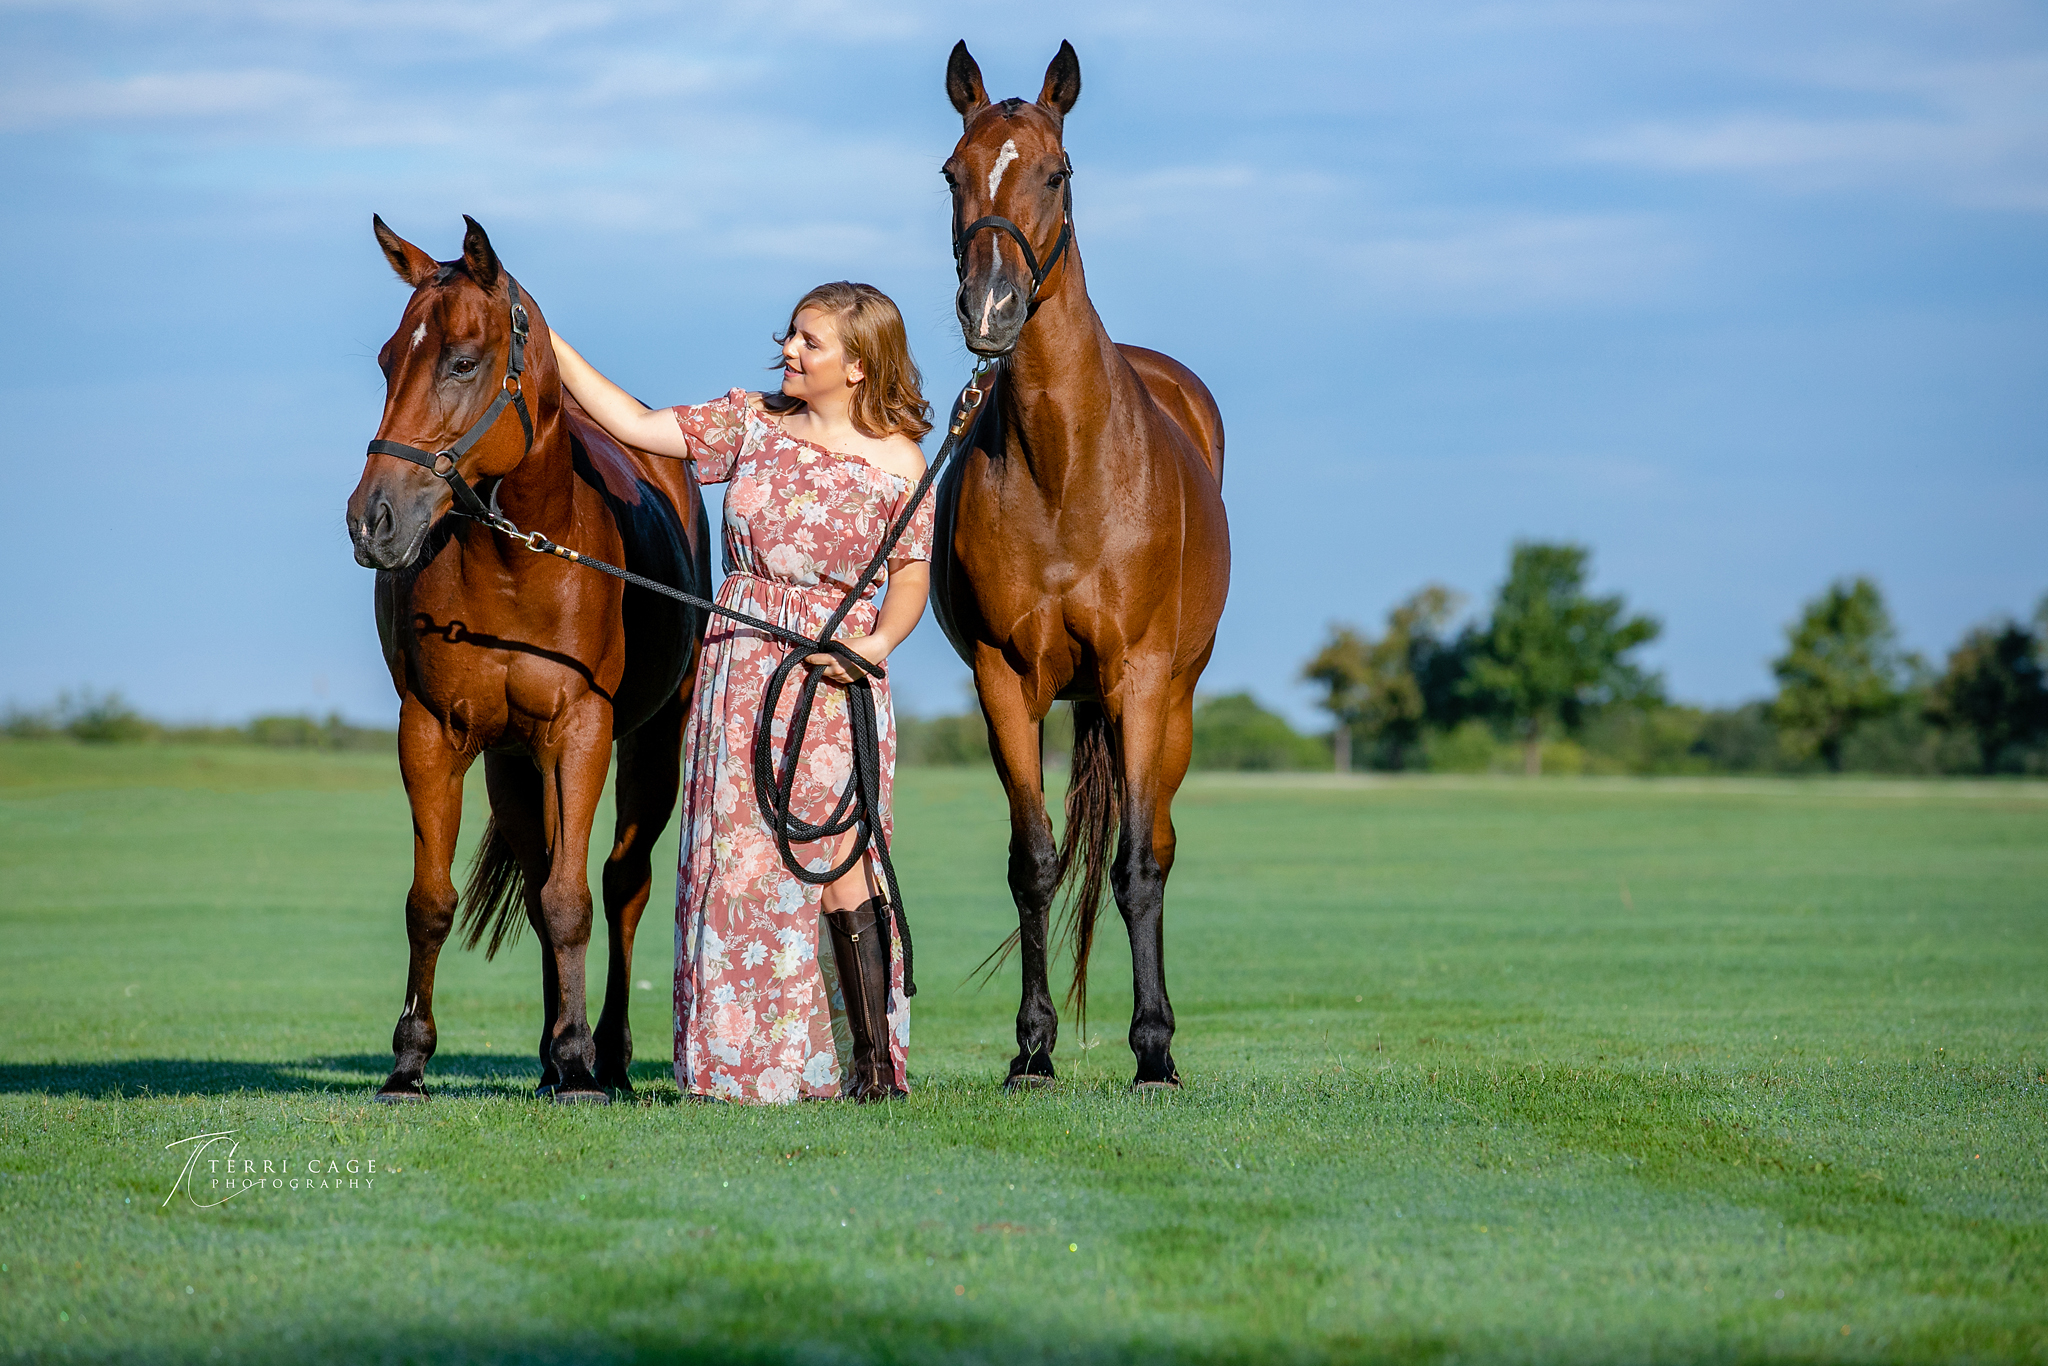 walking with horses photo.jpg